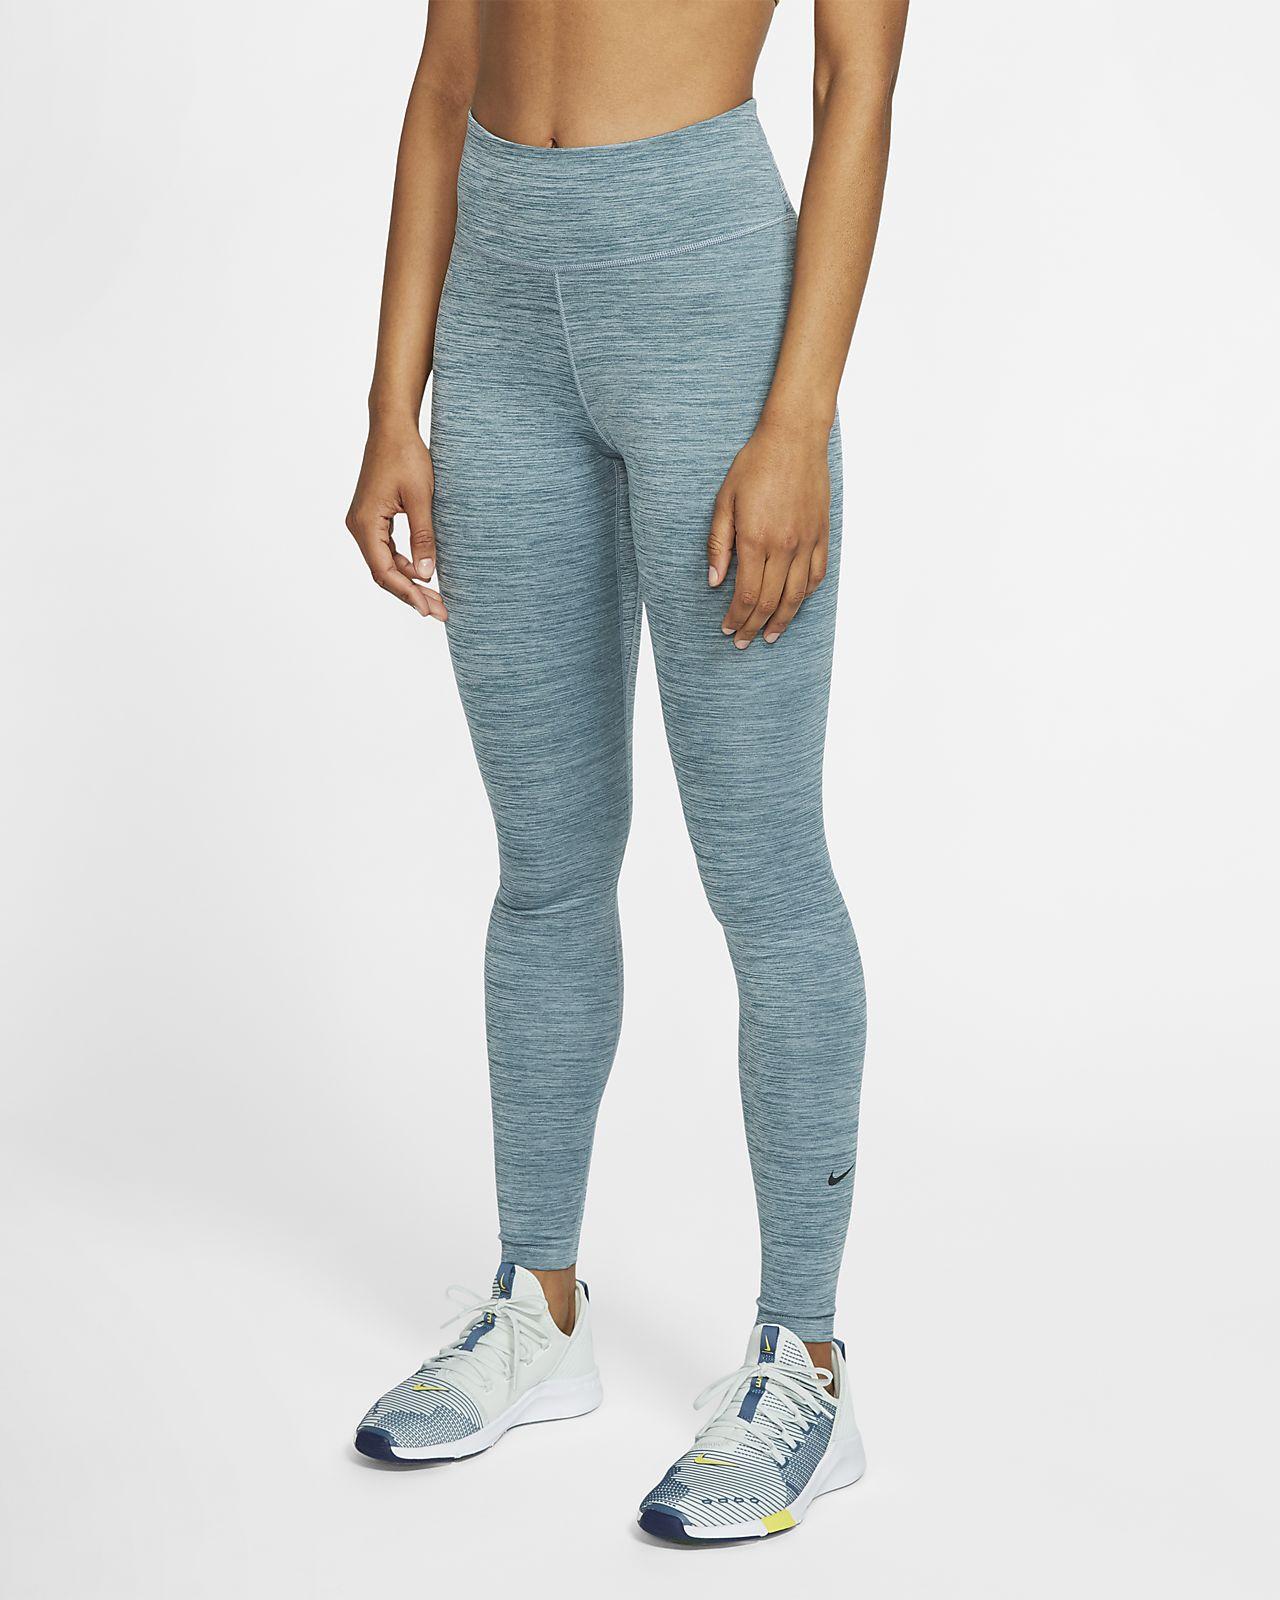 Женские тайтсы Nike One